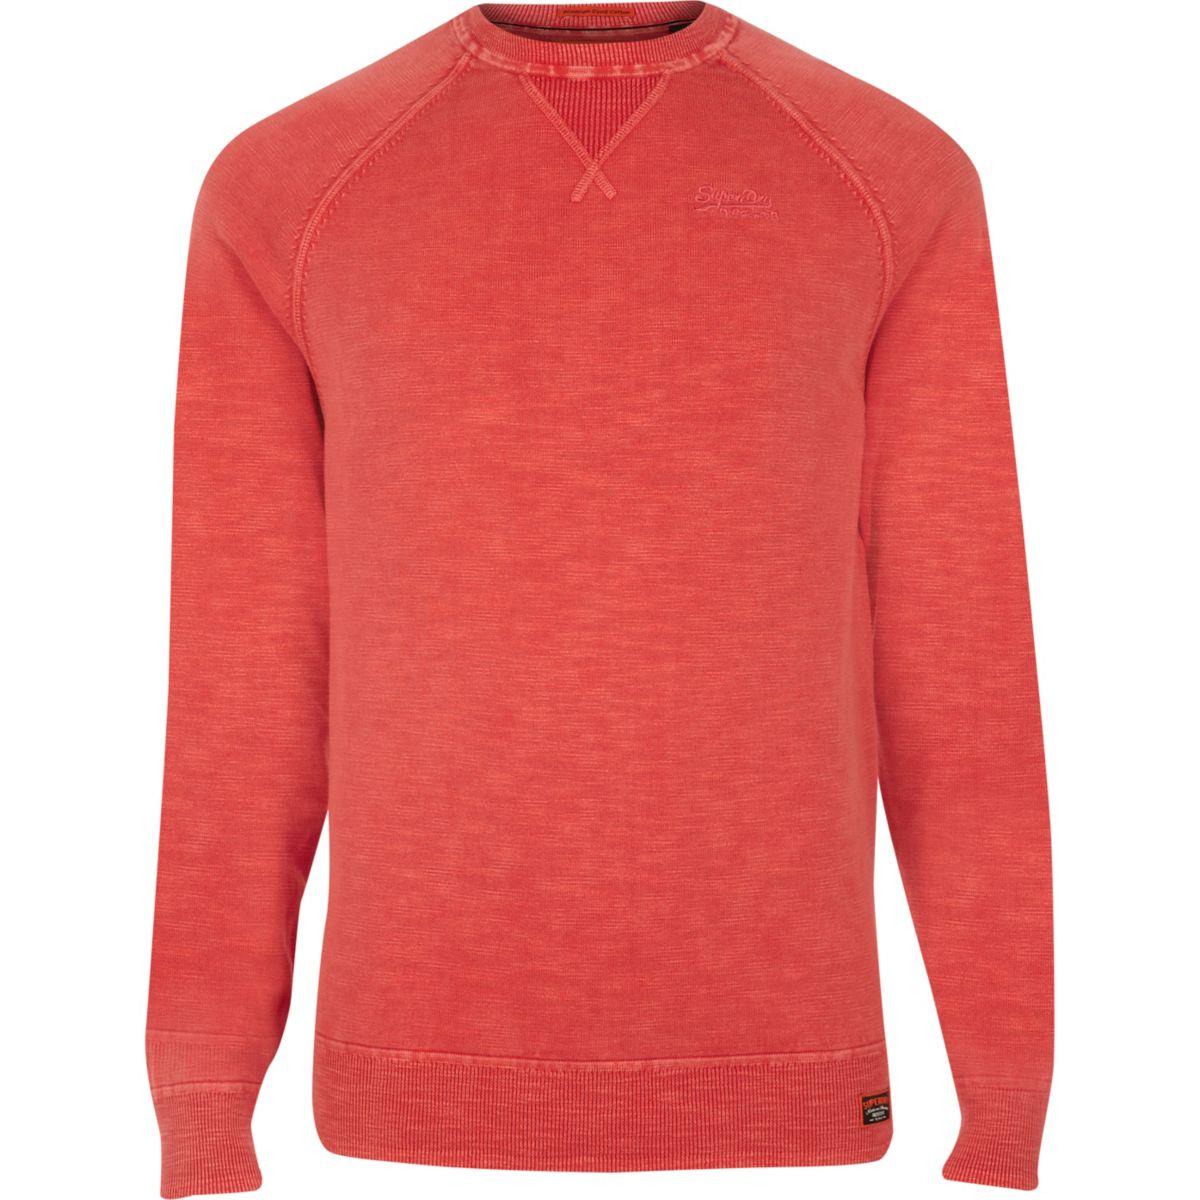 Superdry orange sweater